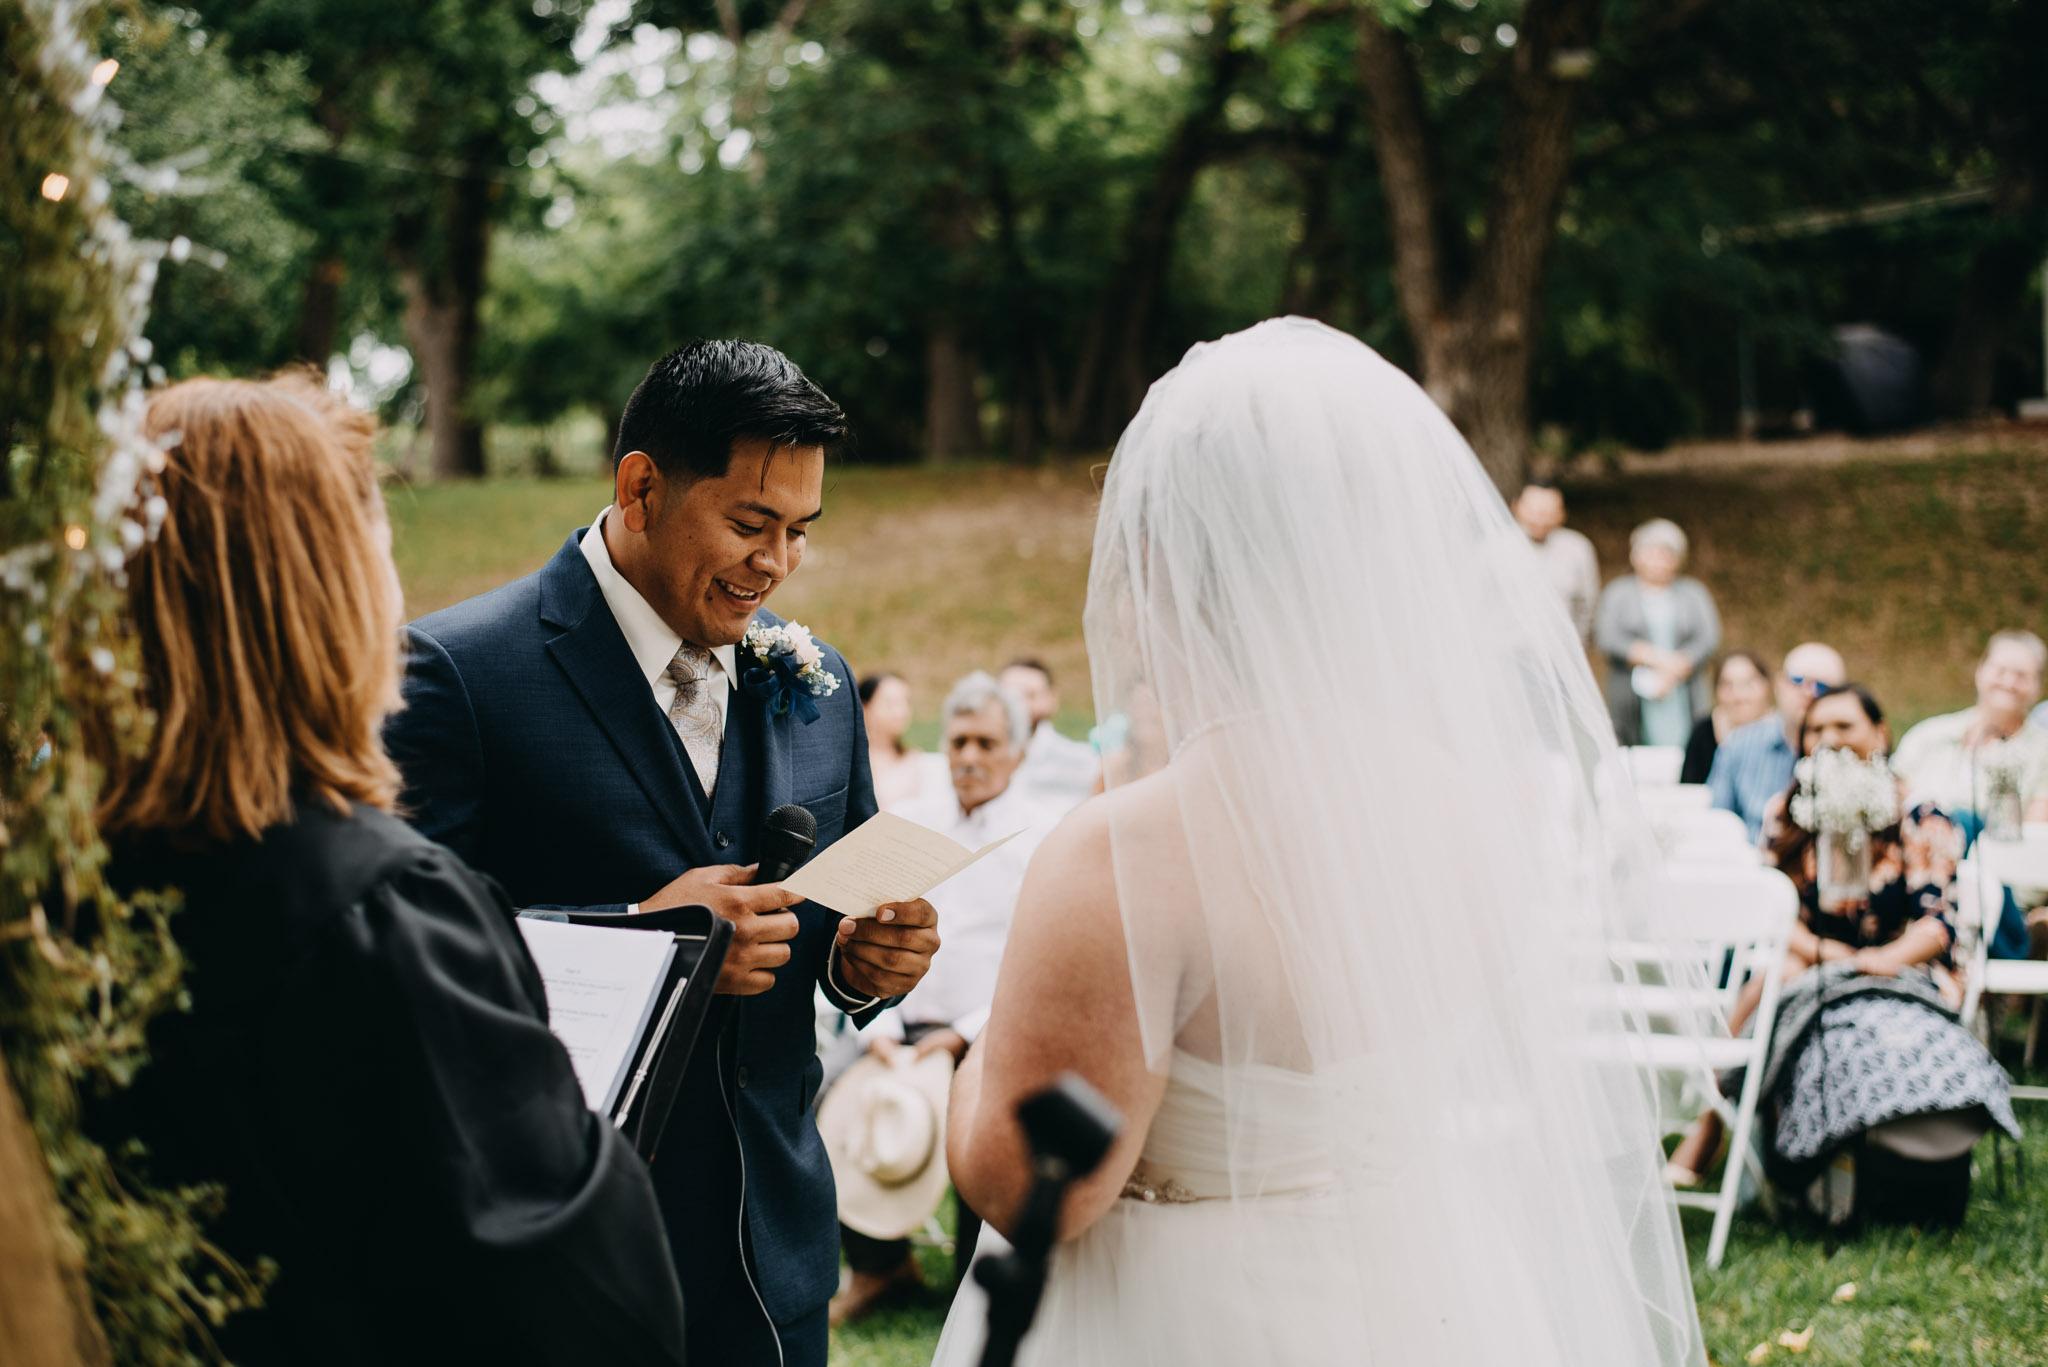 Christoval-Texas-Wedding_Photographer-Meghan&Tony-0013.jpg